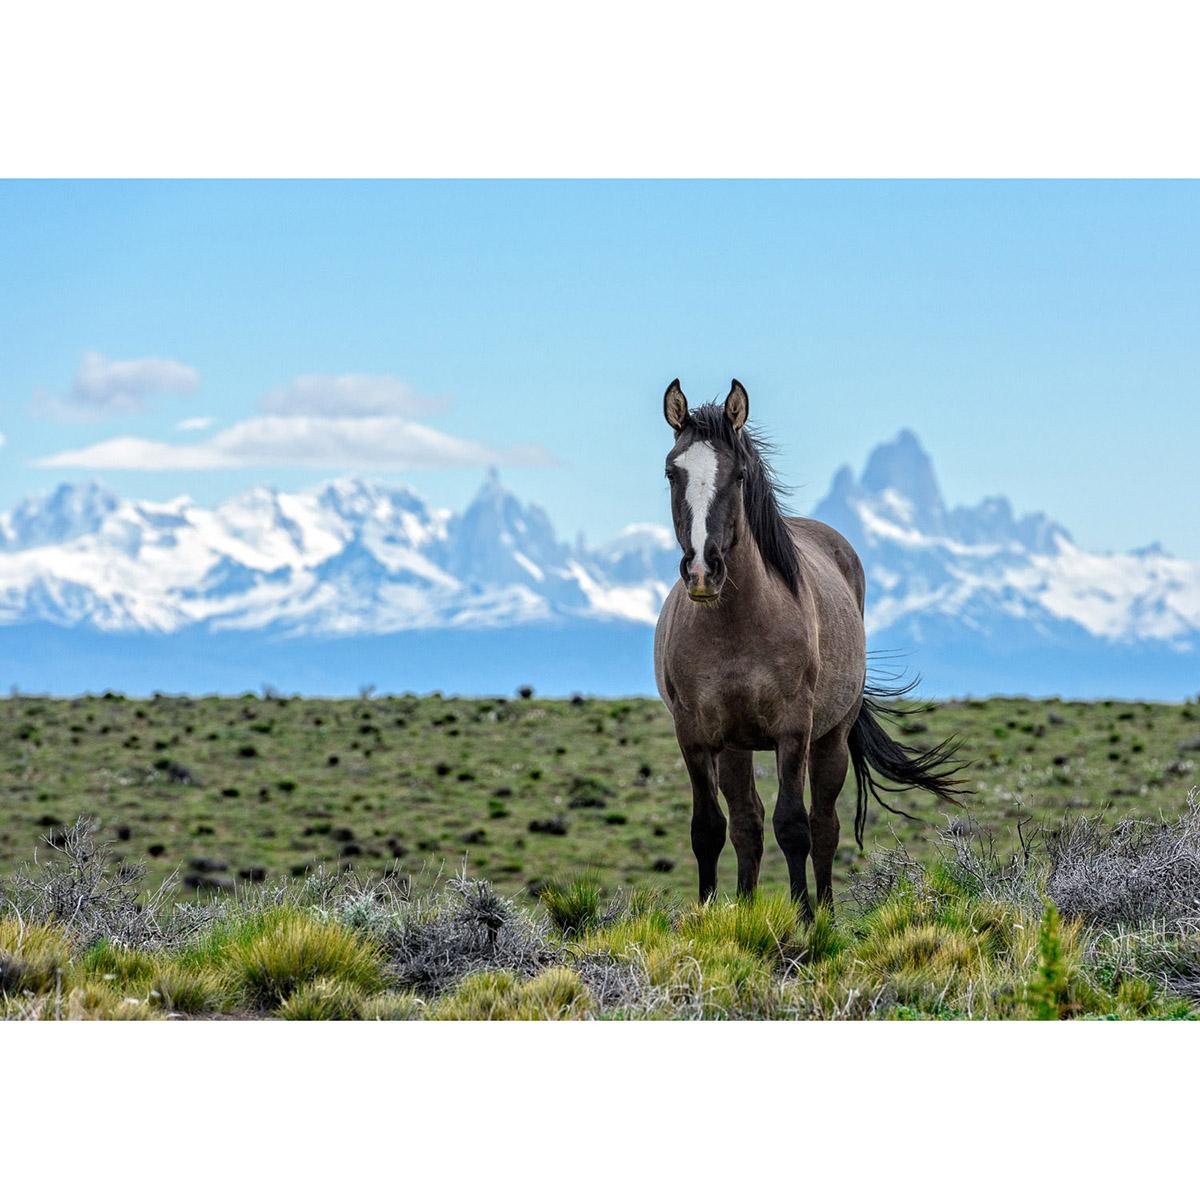 Patagonia Horse